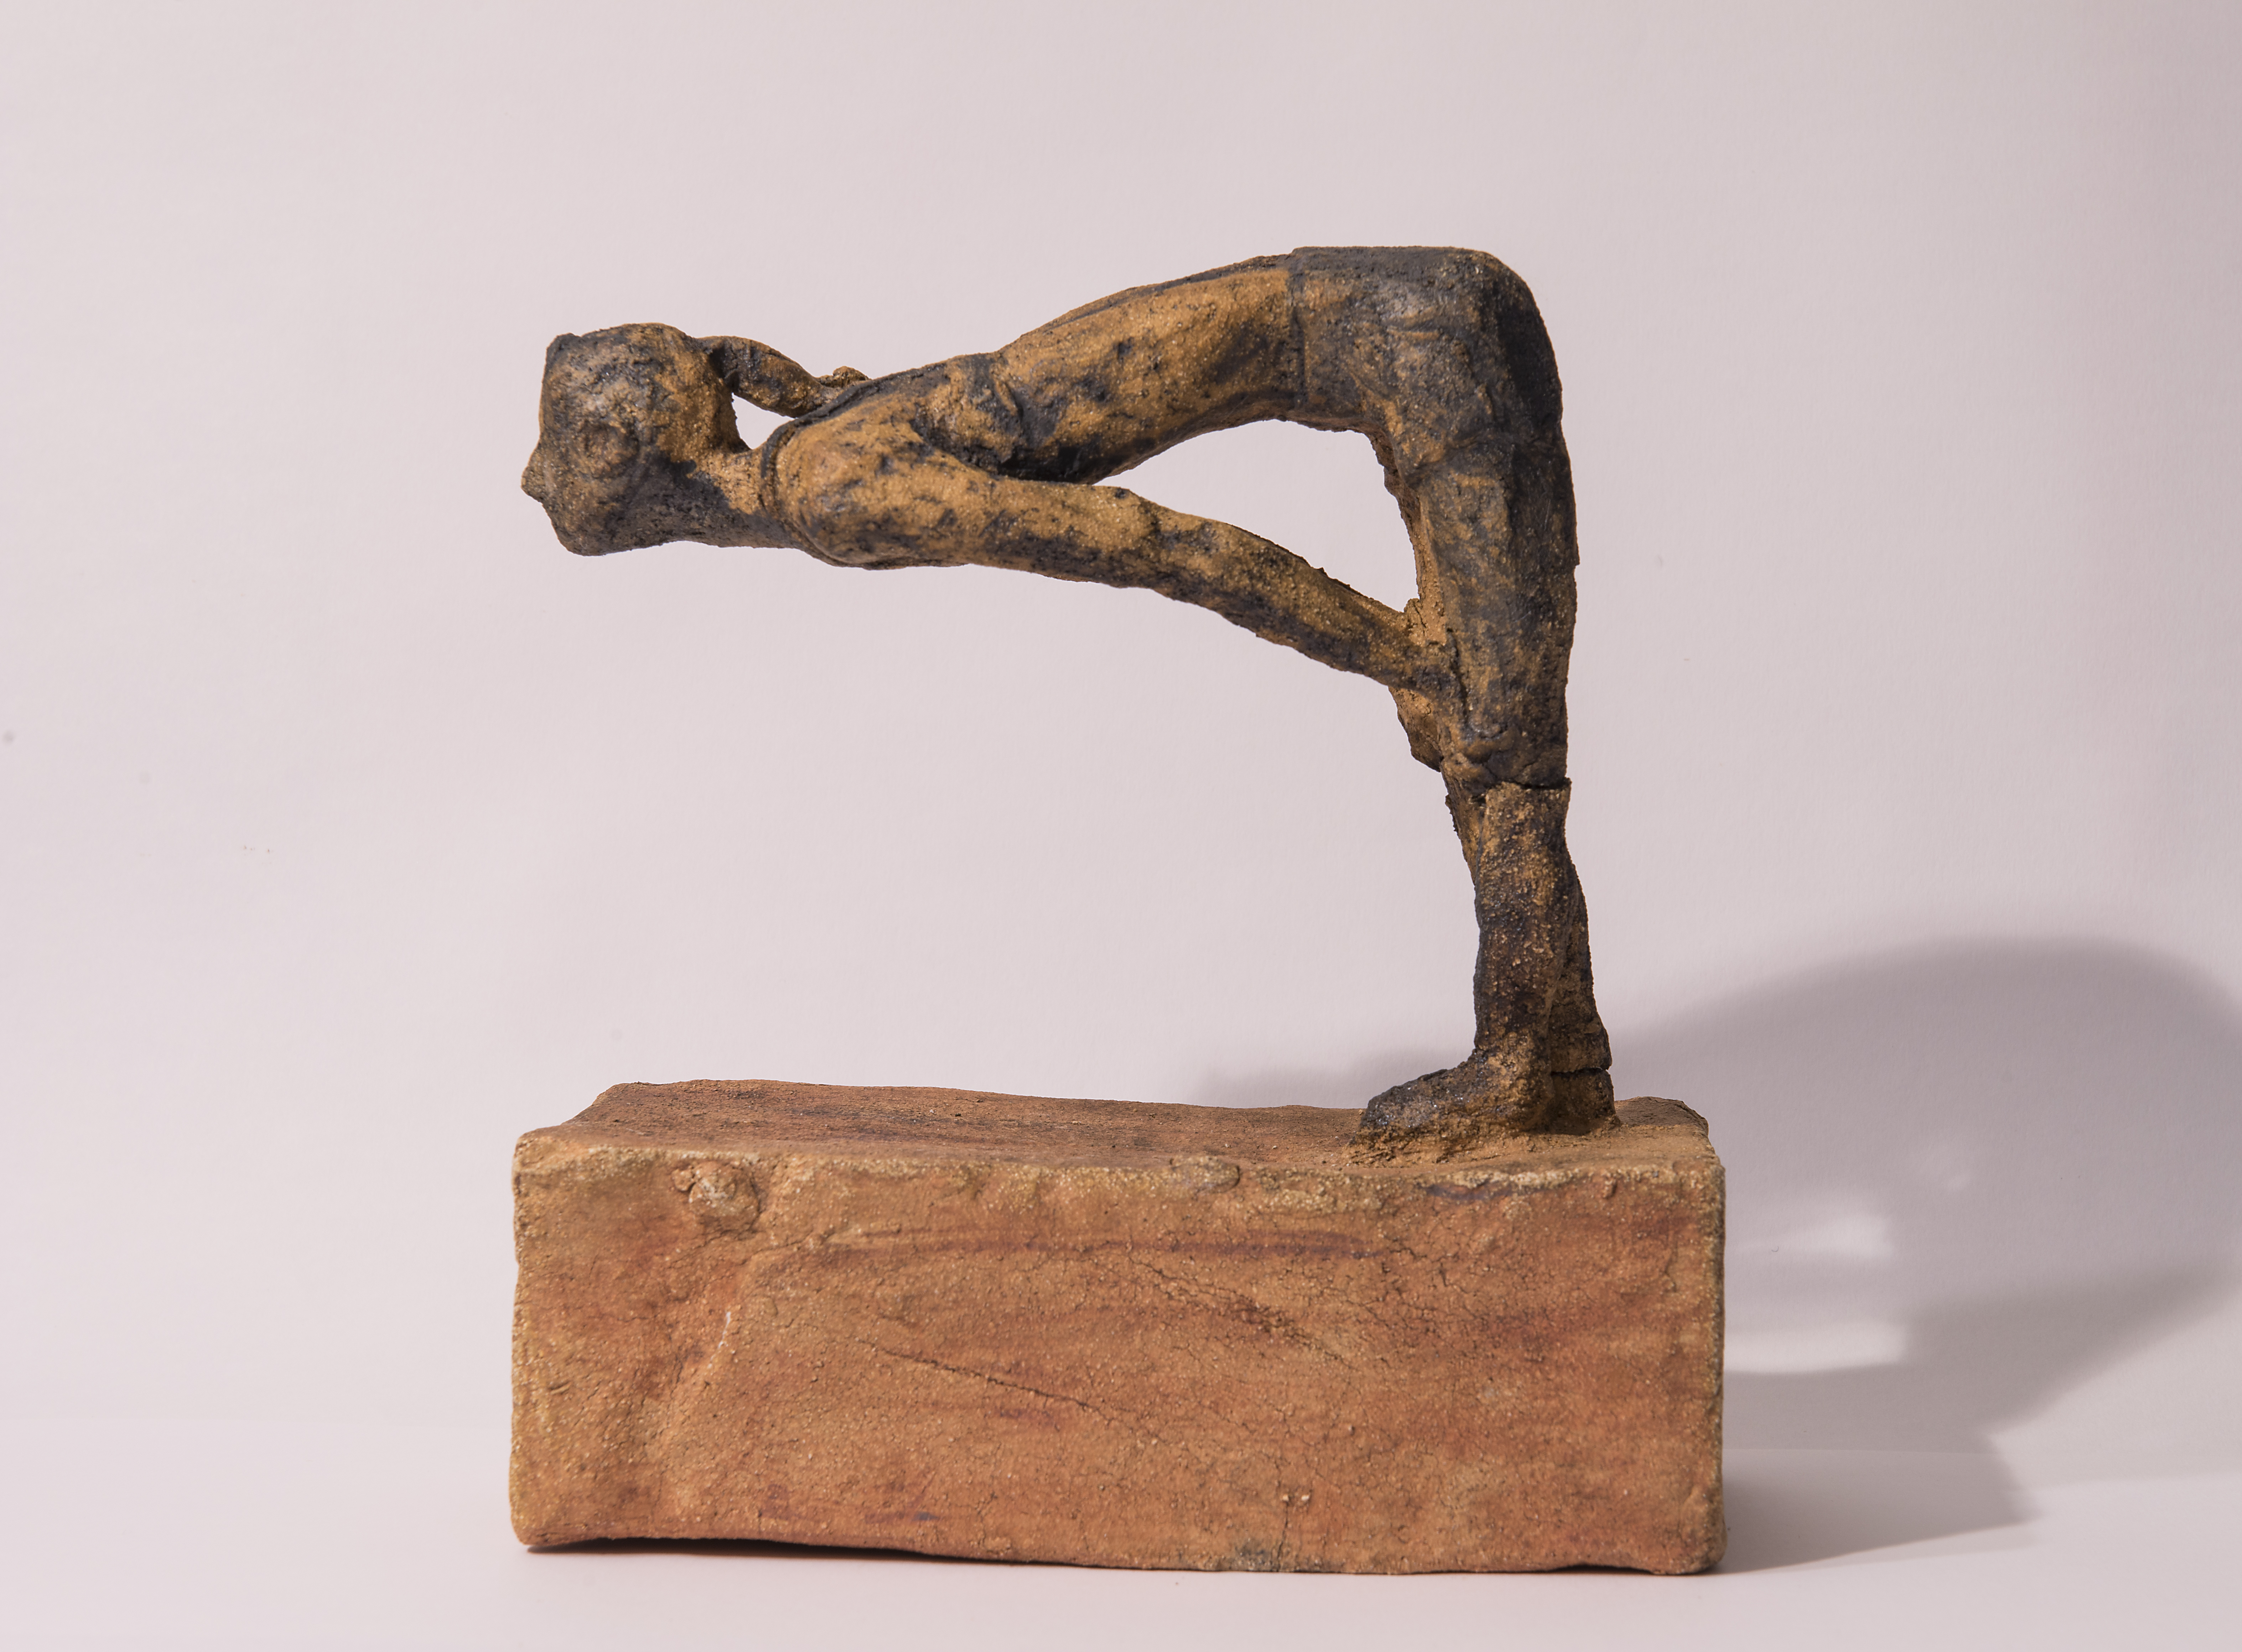 Clodagh stretching